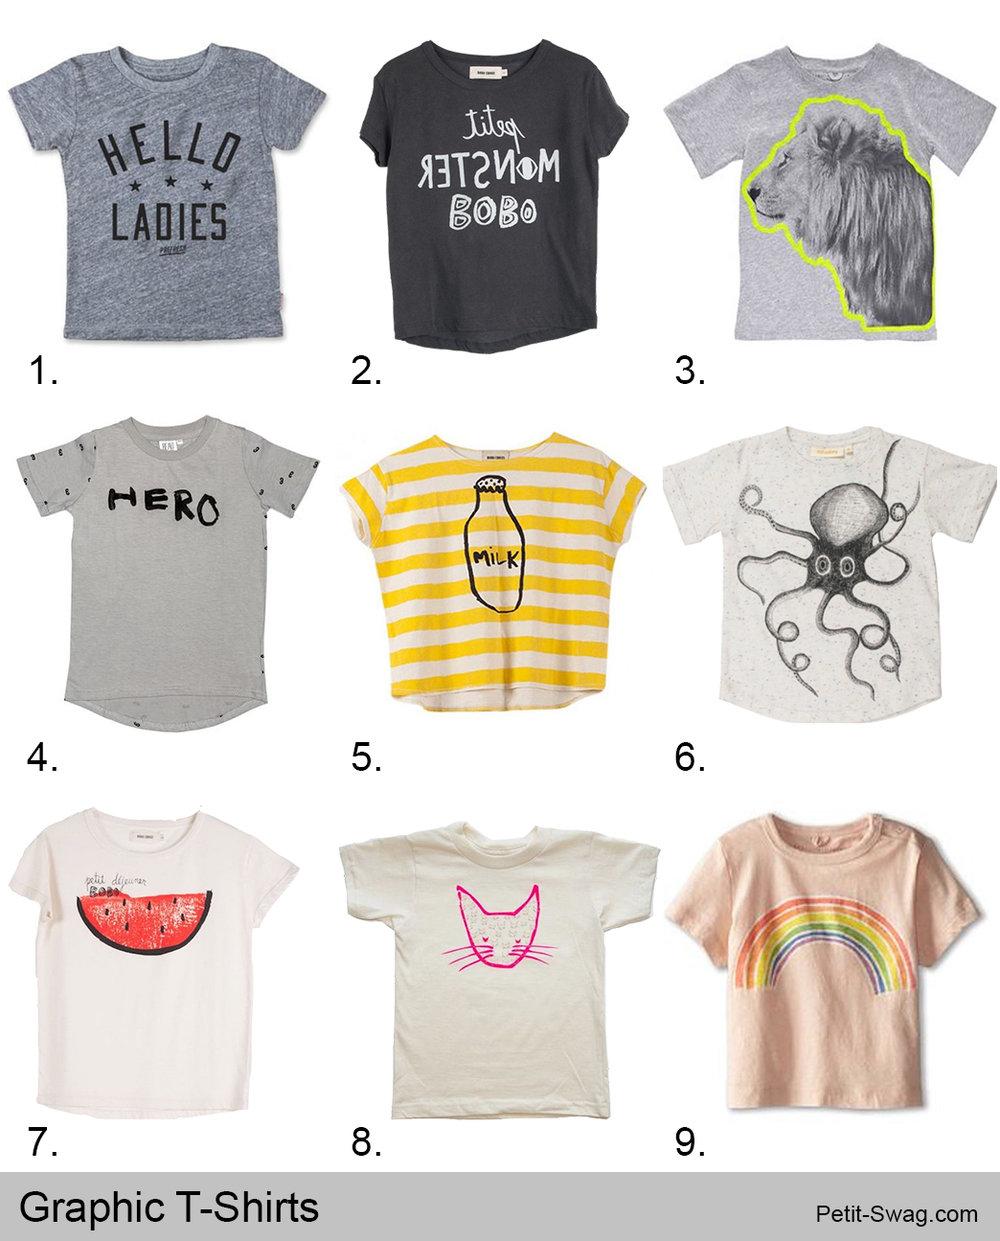 Graphic T-Shirts | Petit-Swag.com